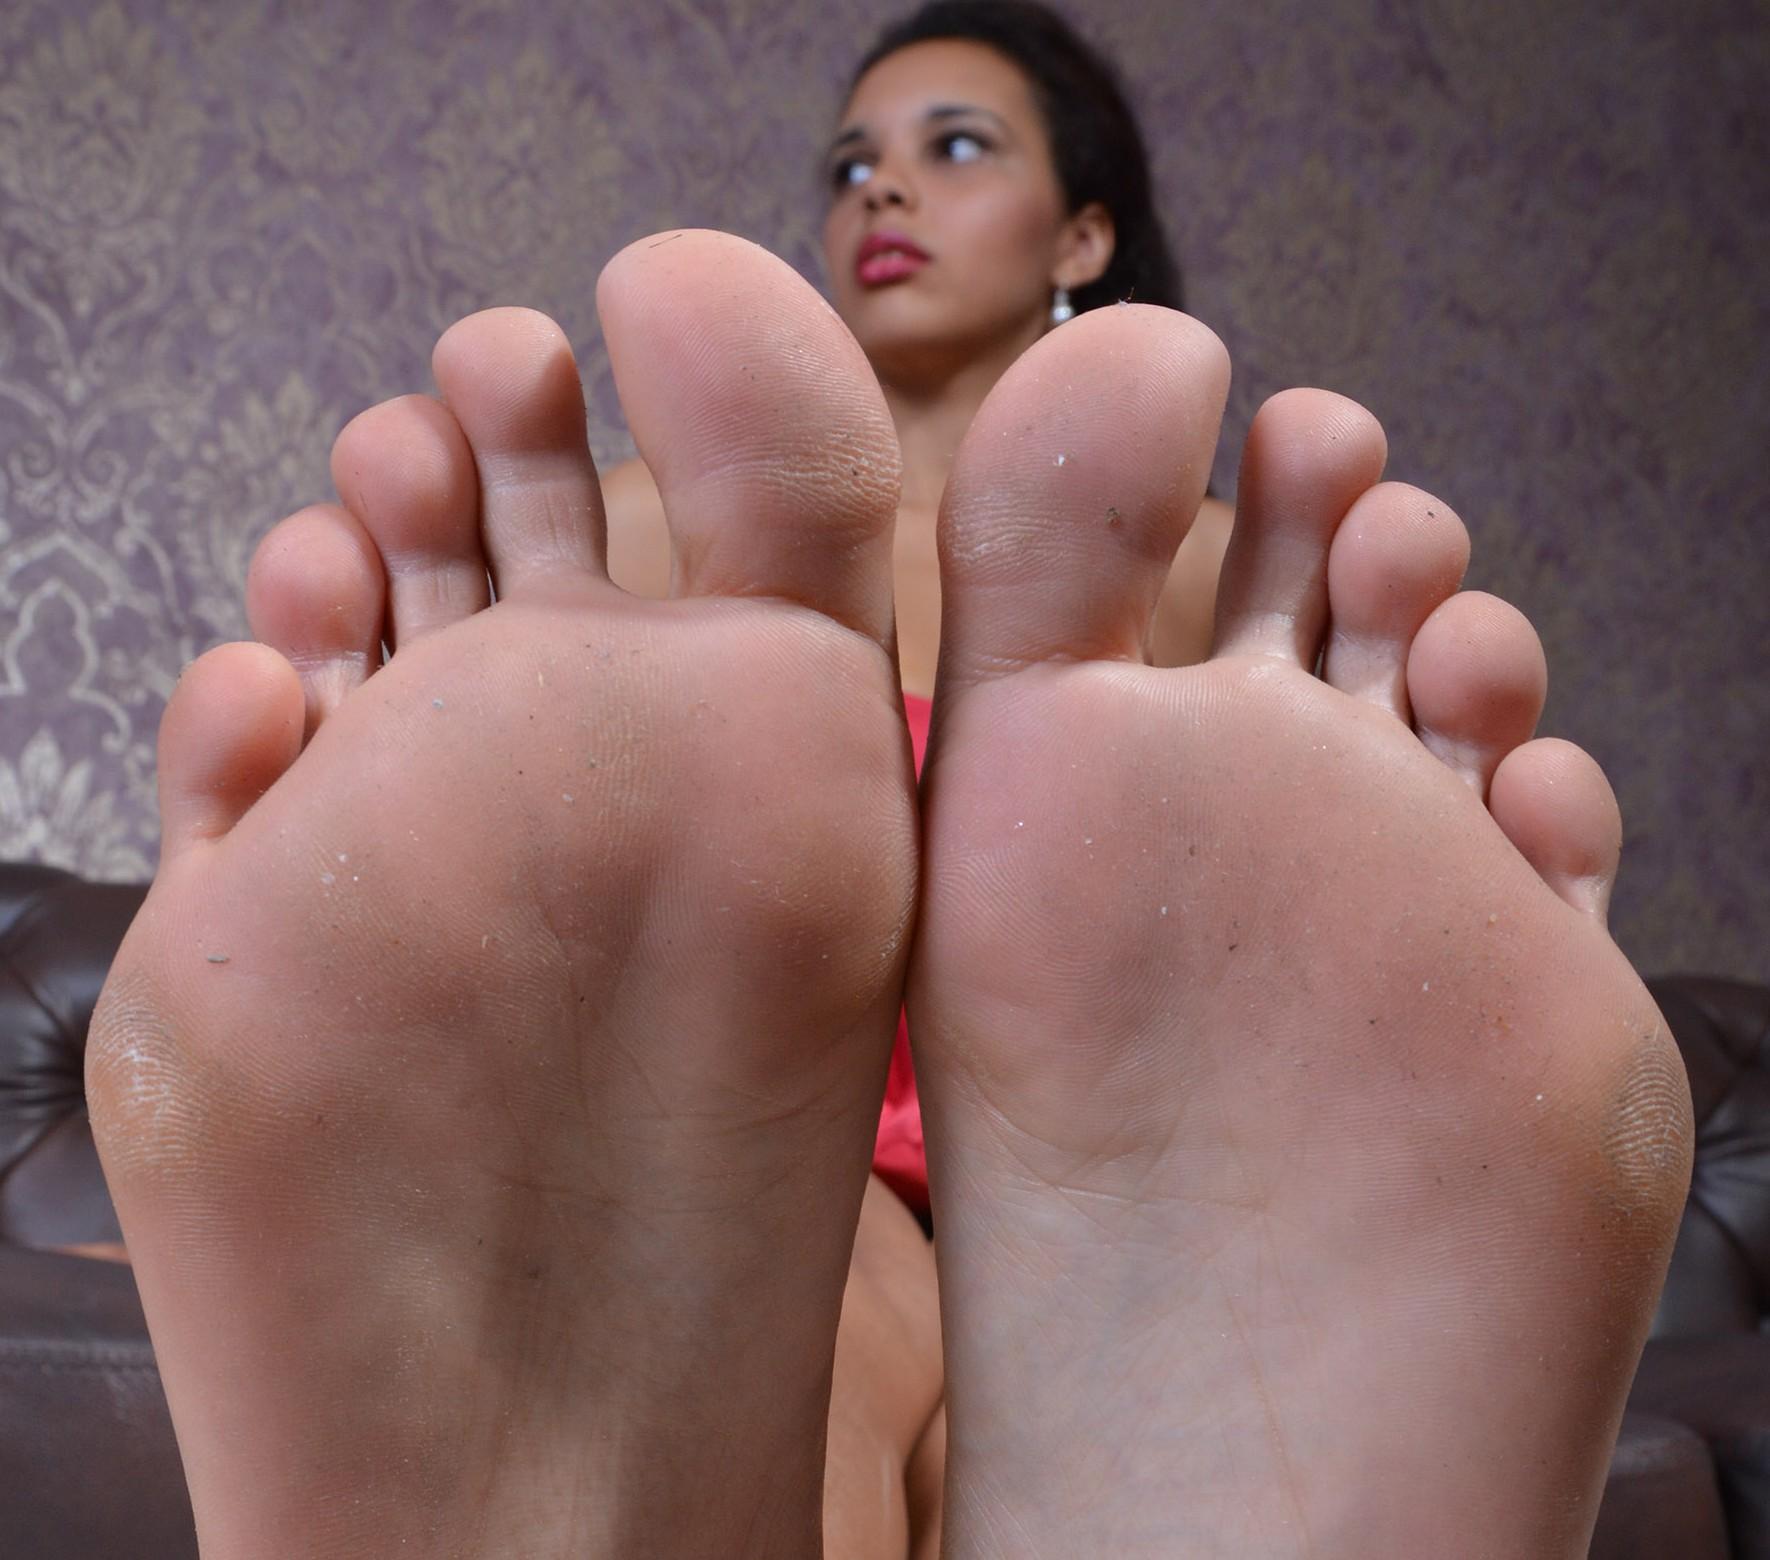 Tashas Füße Größe 40